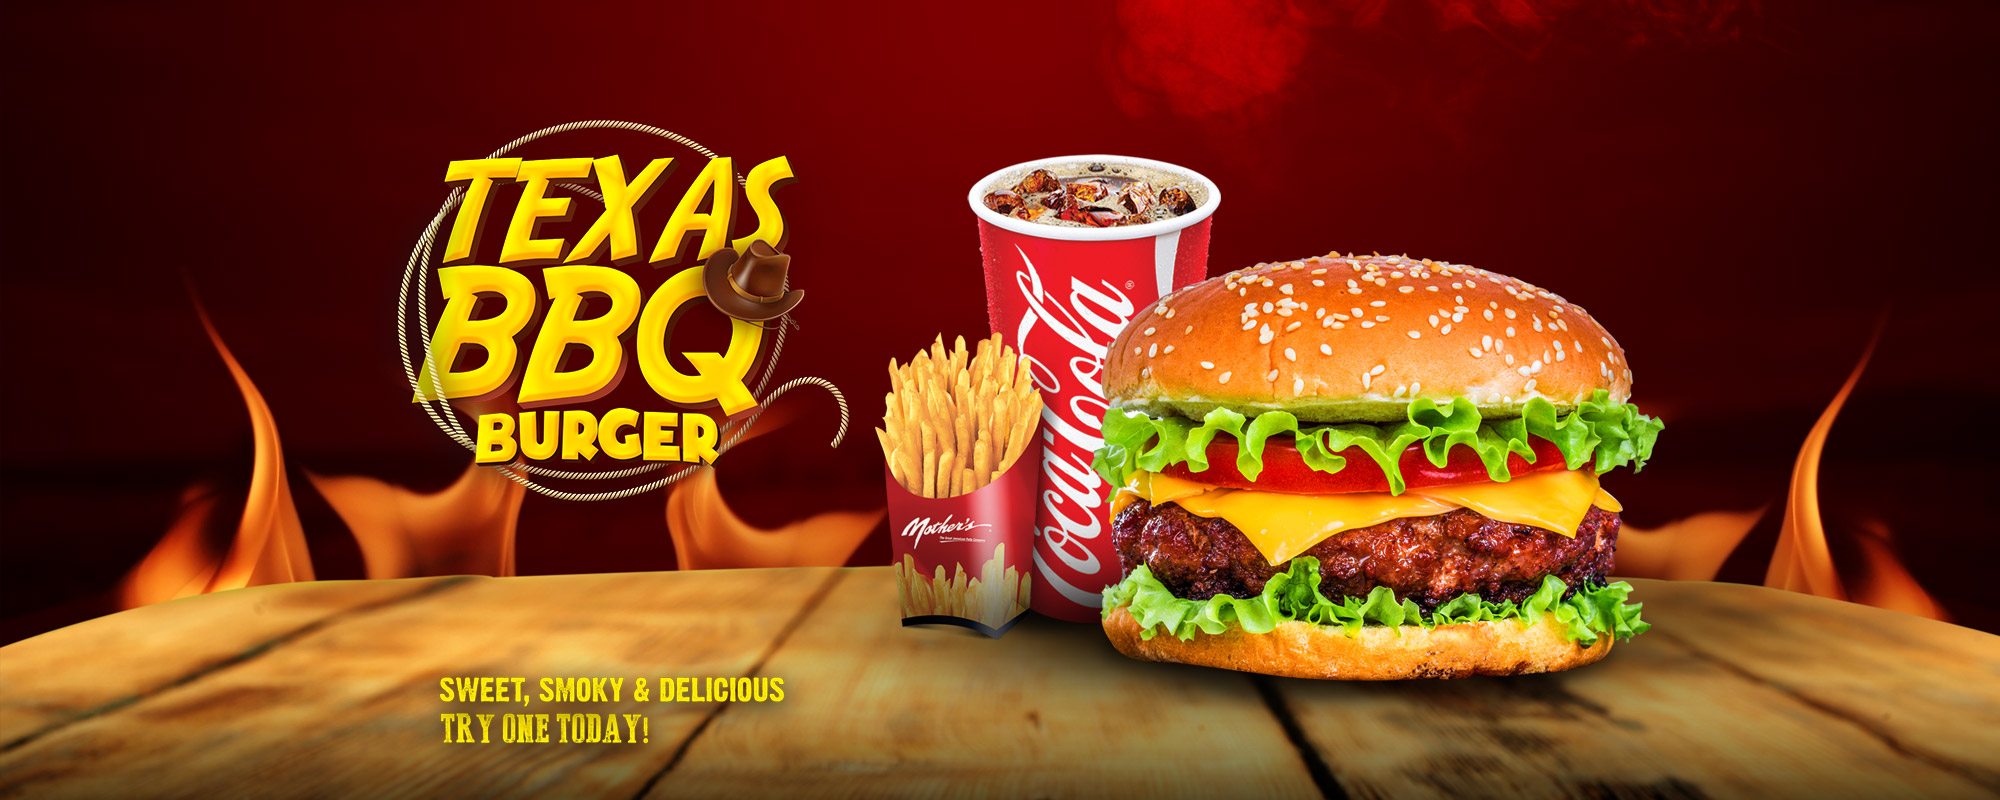 hm-bbq-burger